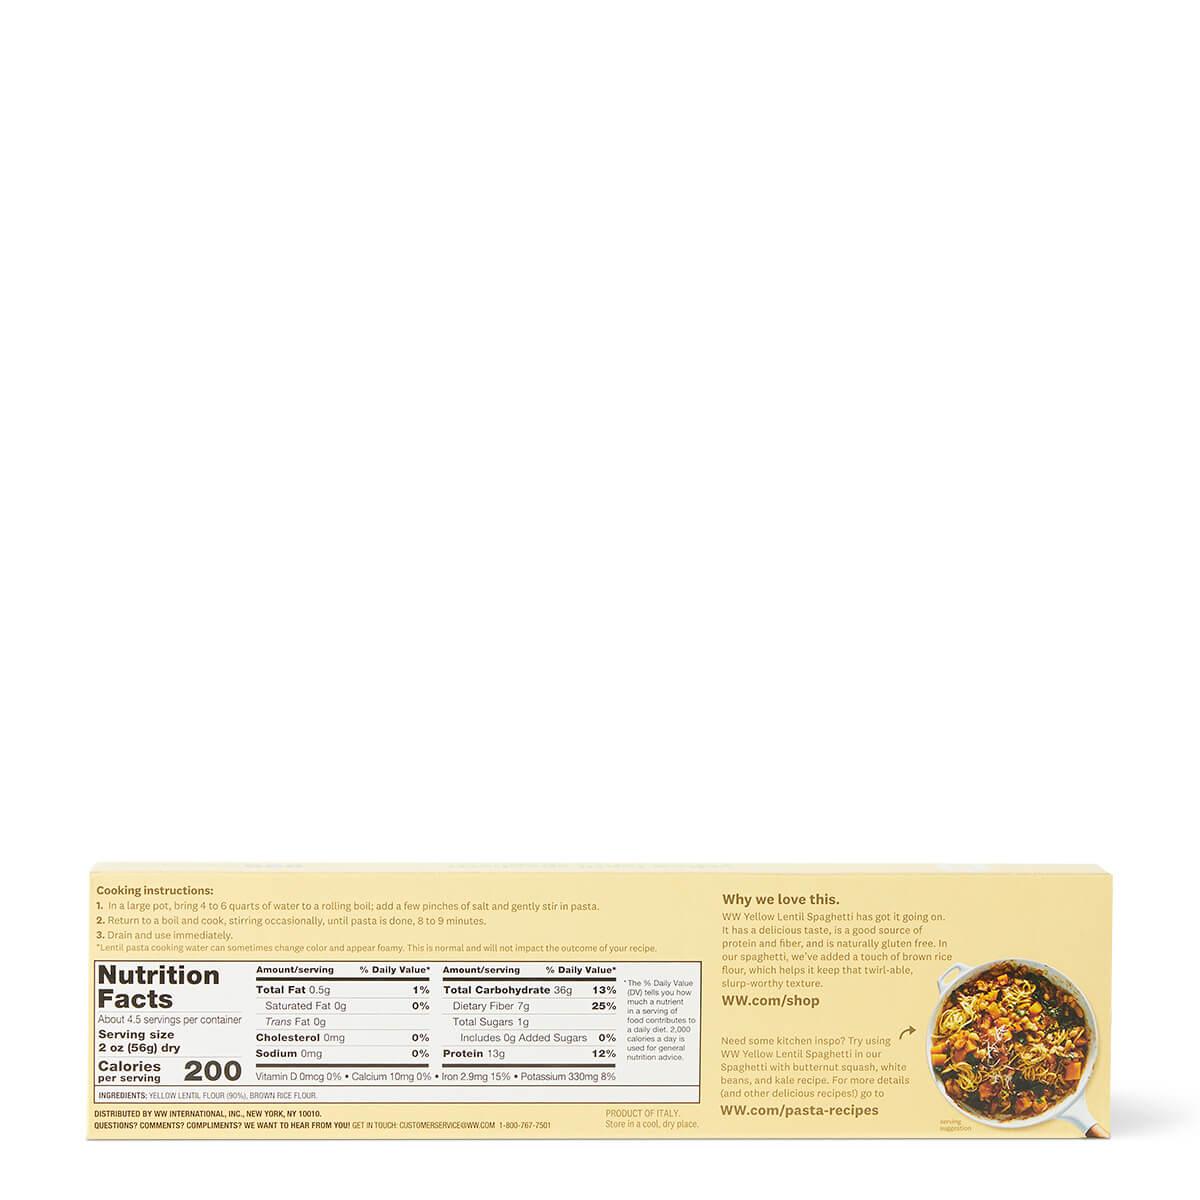 Yellow Lentil Spaghetti - back